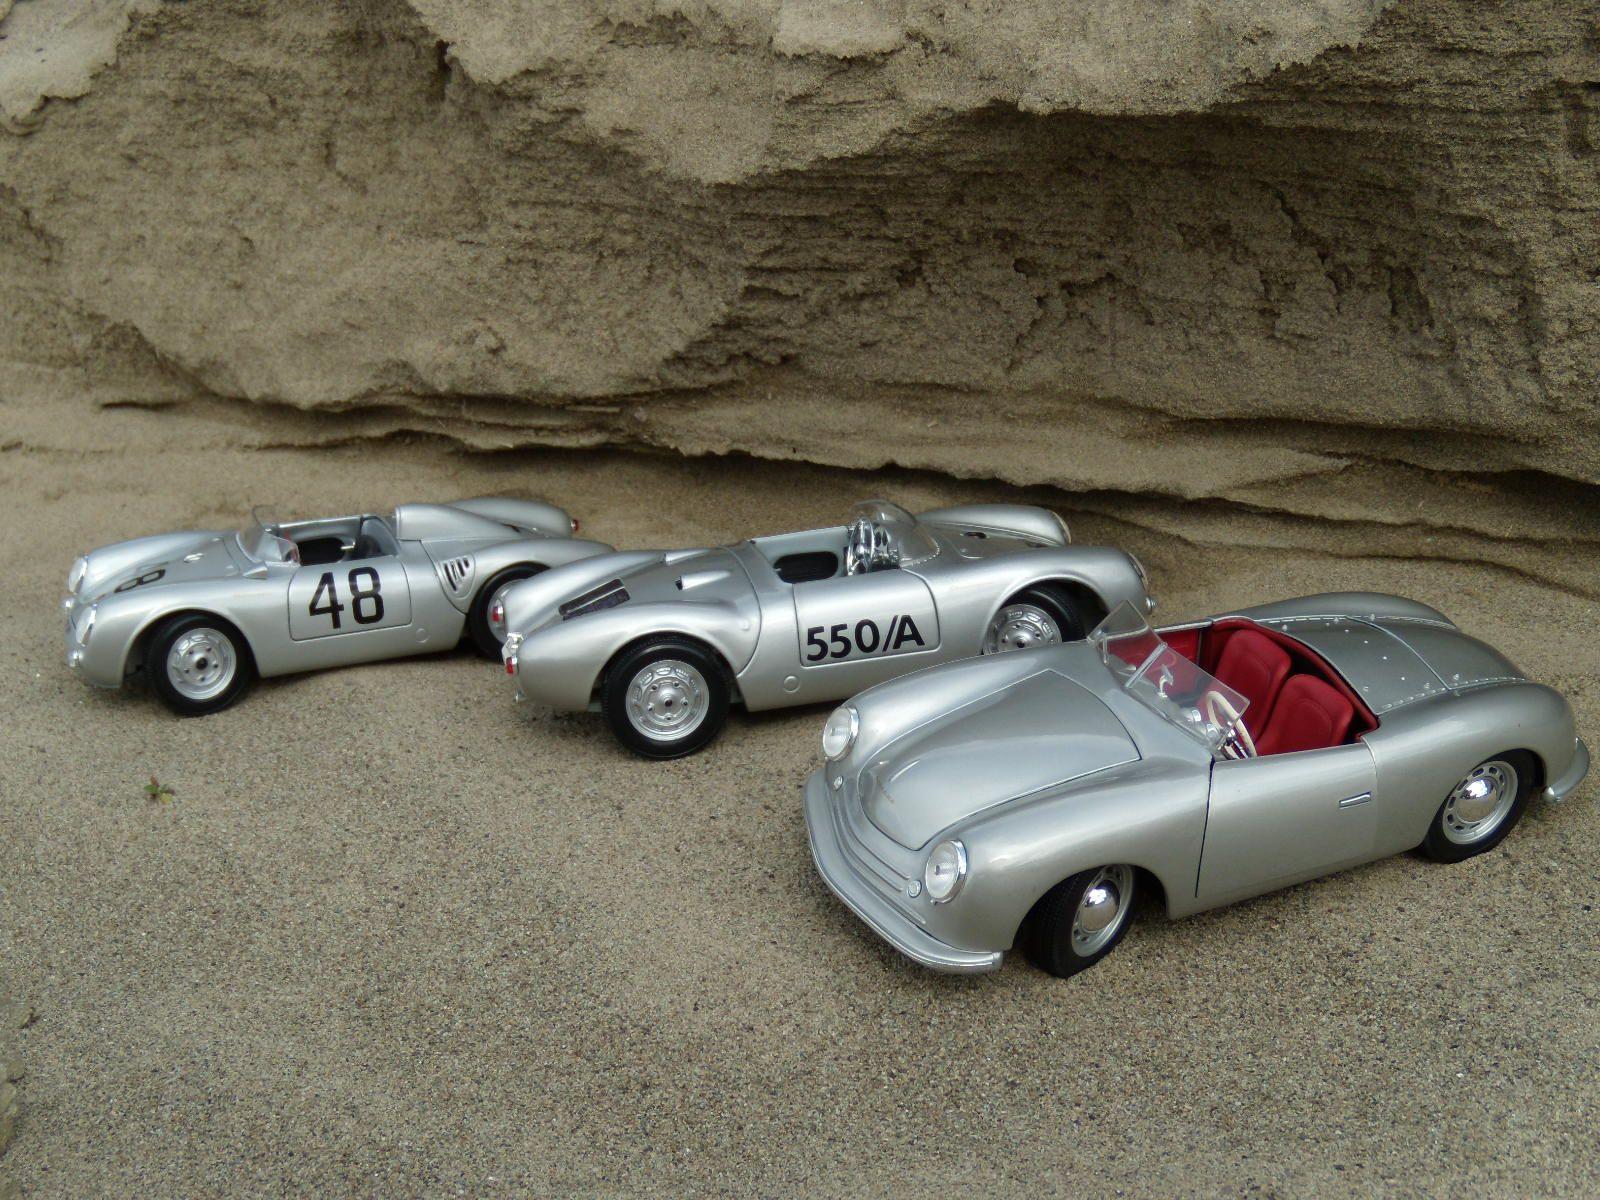 38ac6428b2fec144c58a044ba95b079a Outstanding Maisto Porsche 911 Gt1 Le Mans 1998 Cars Trend